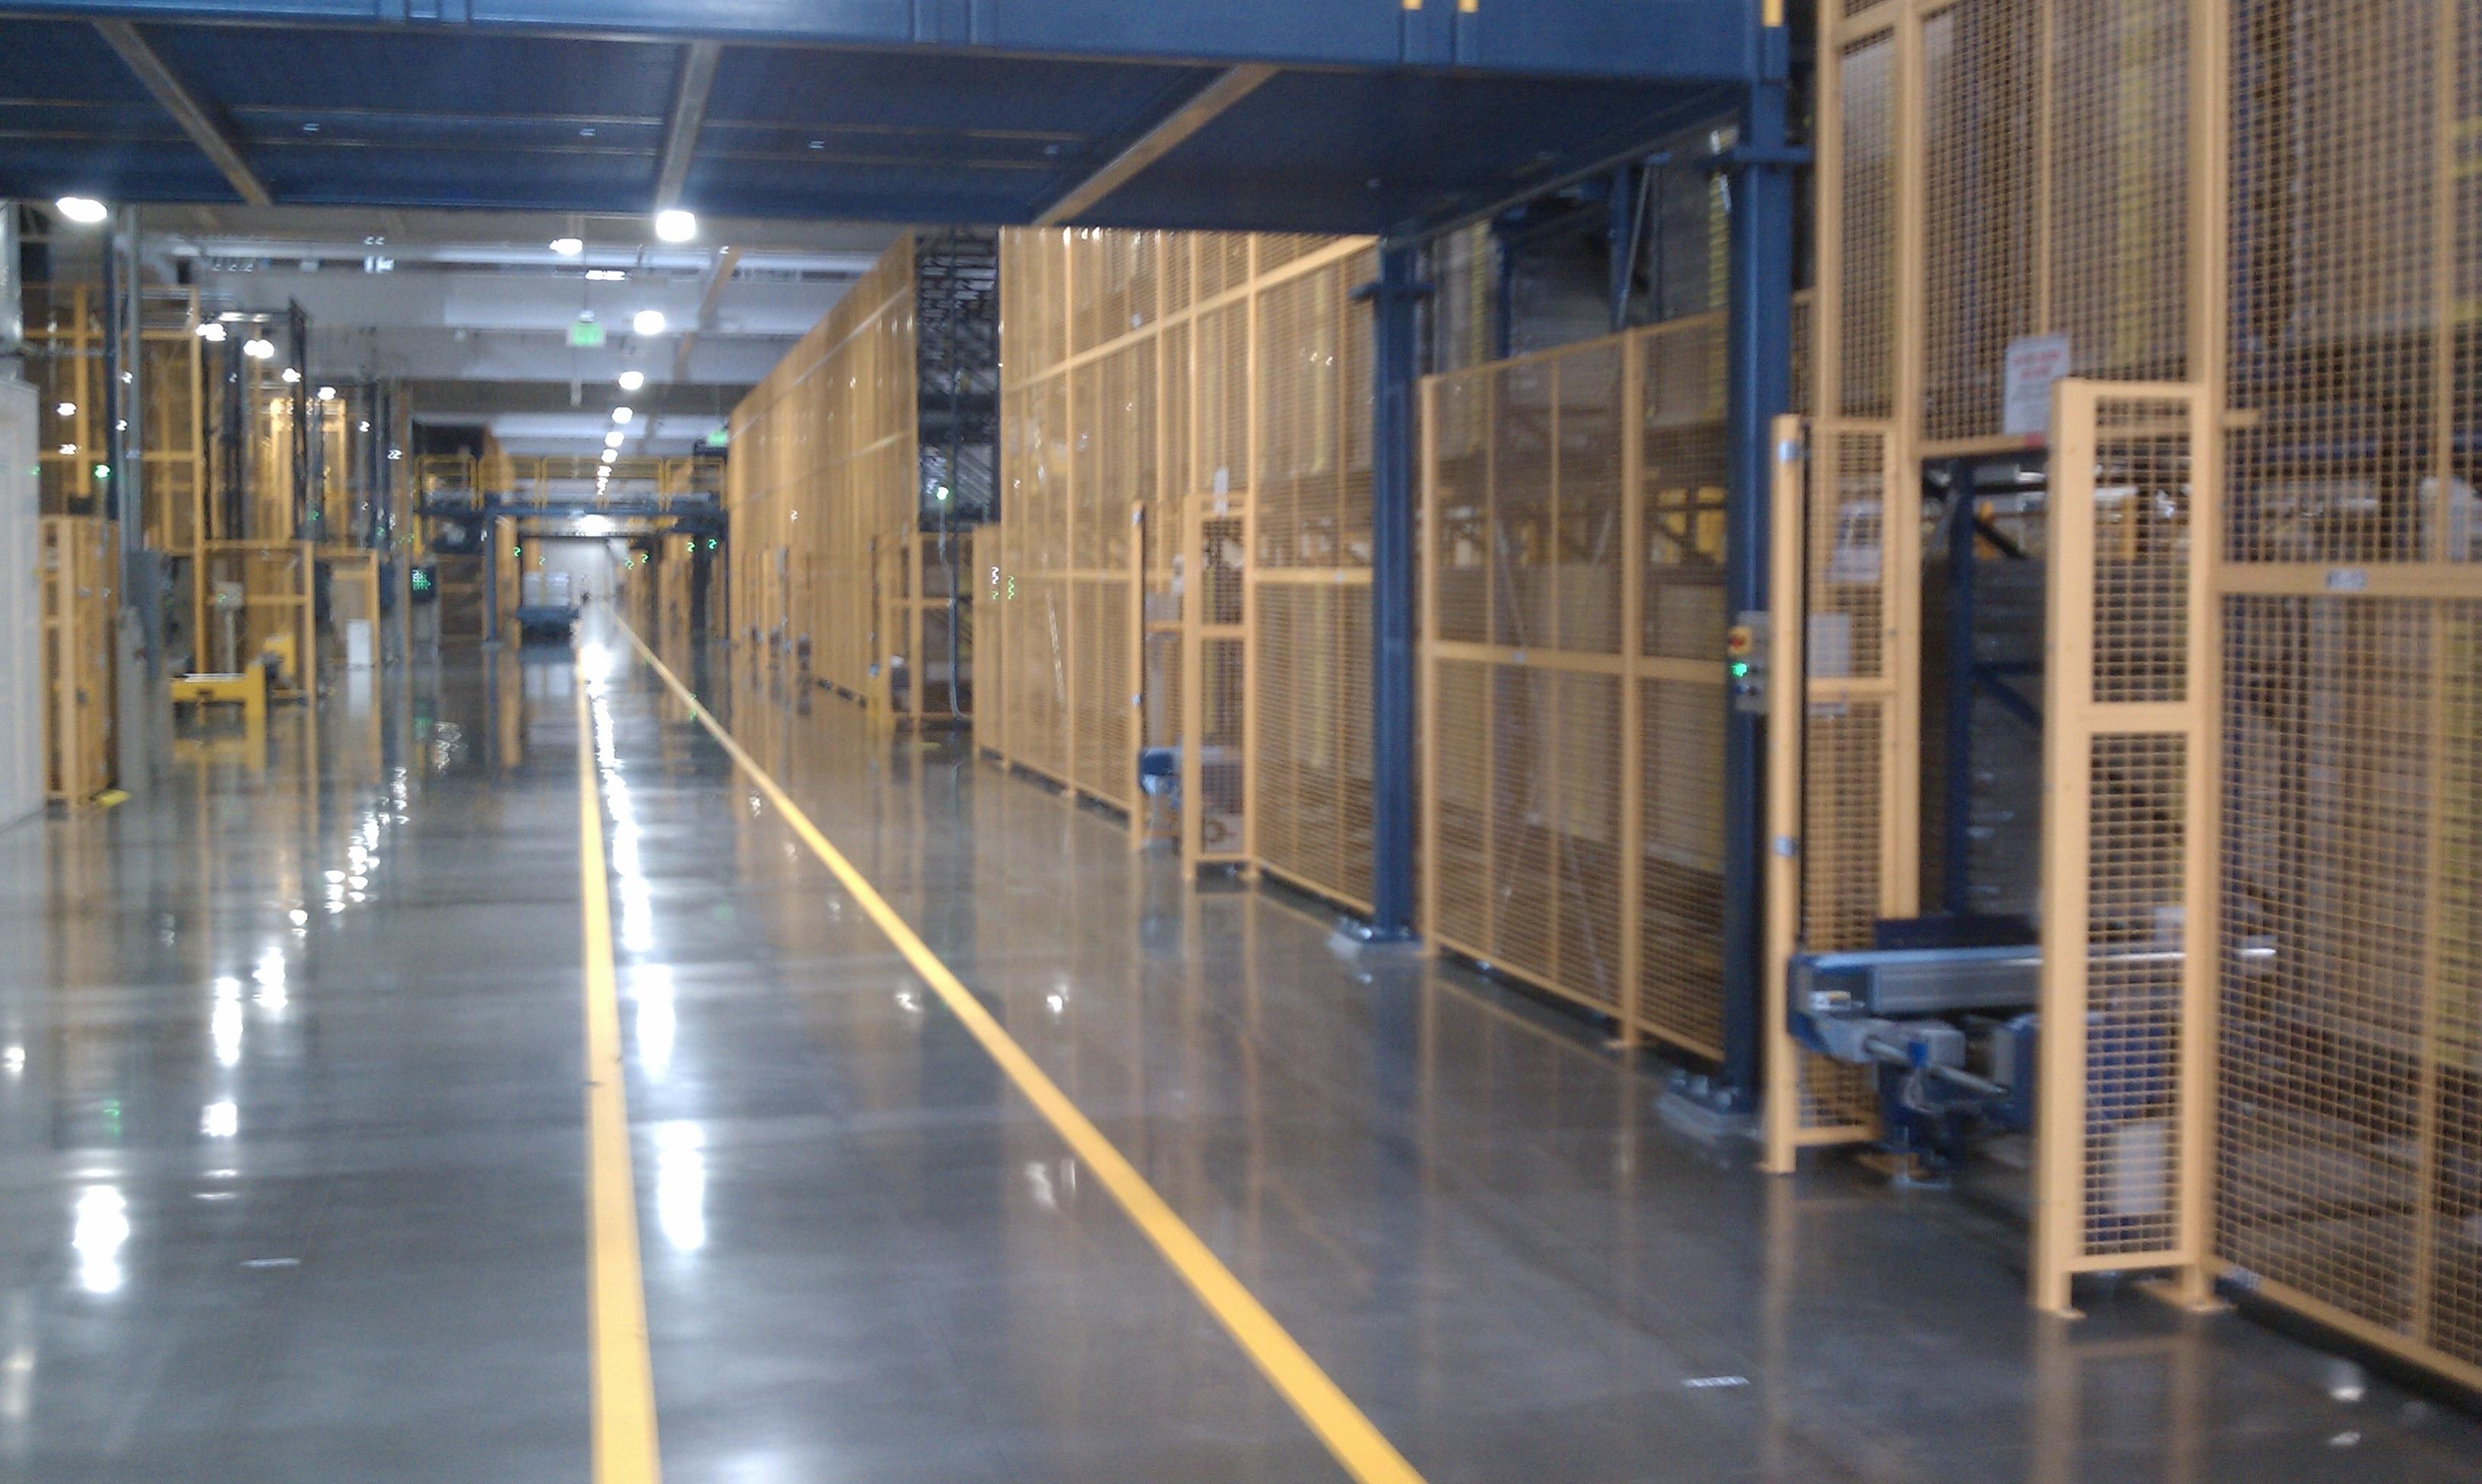 Solyndra's factory floor in April, 2011.